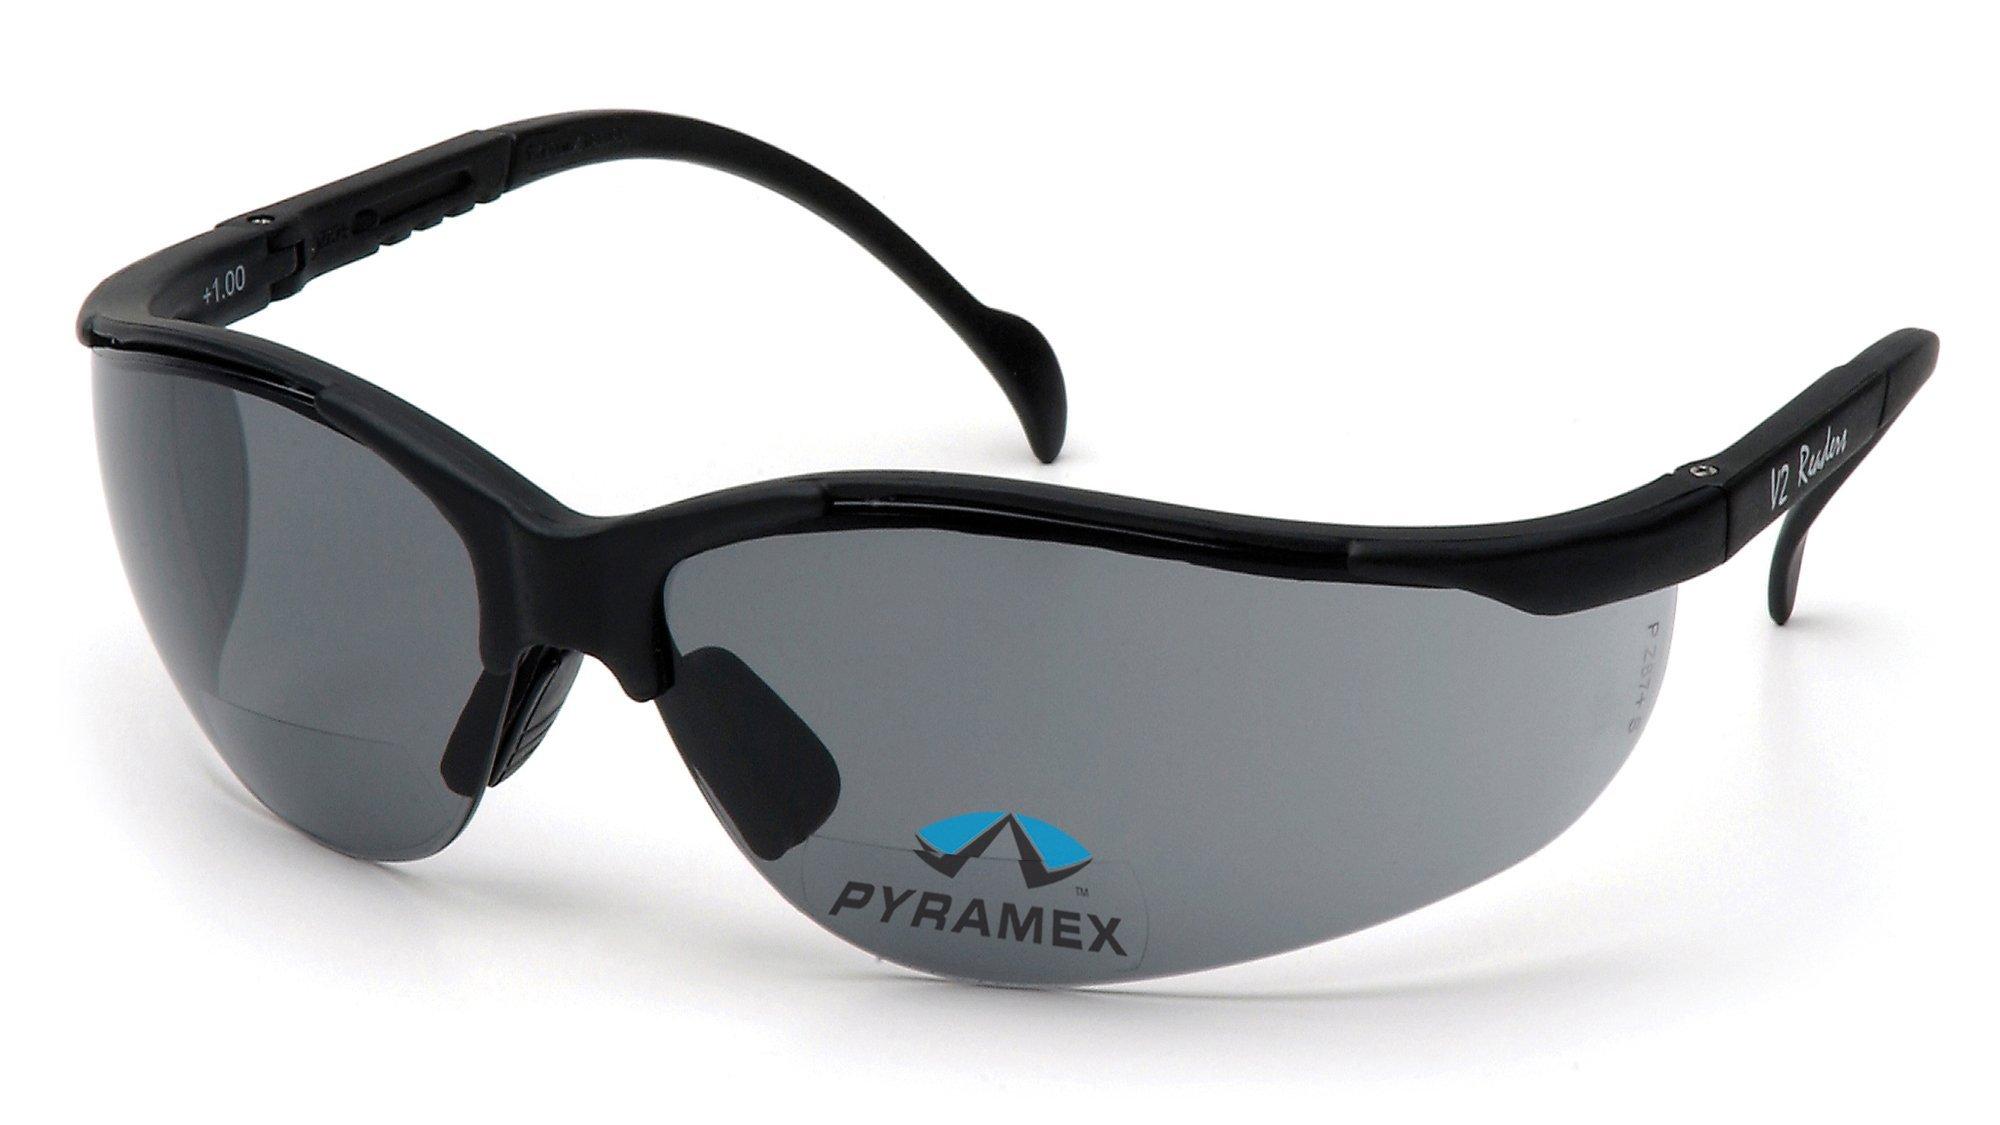 Pyramex V2 Readers Safety Eyewear, Gray +3.0 Lens With Black Frame by Pyramex